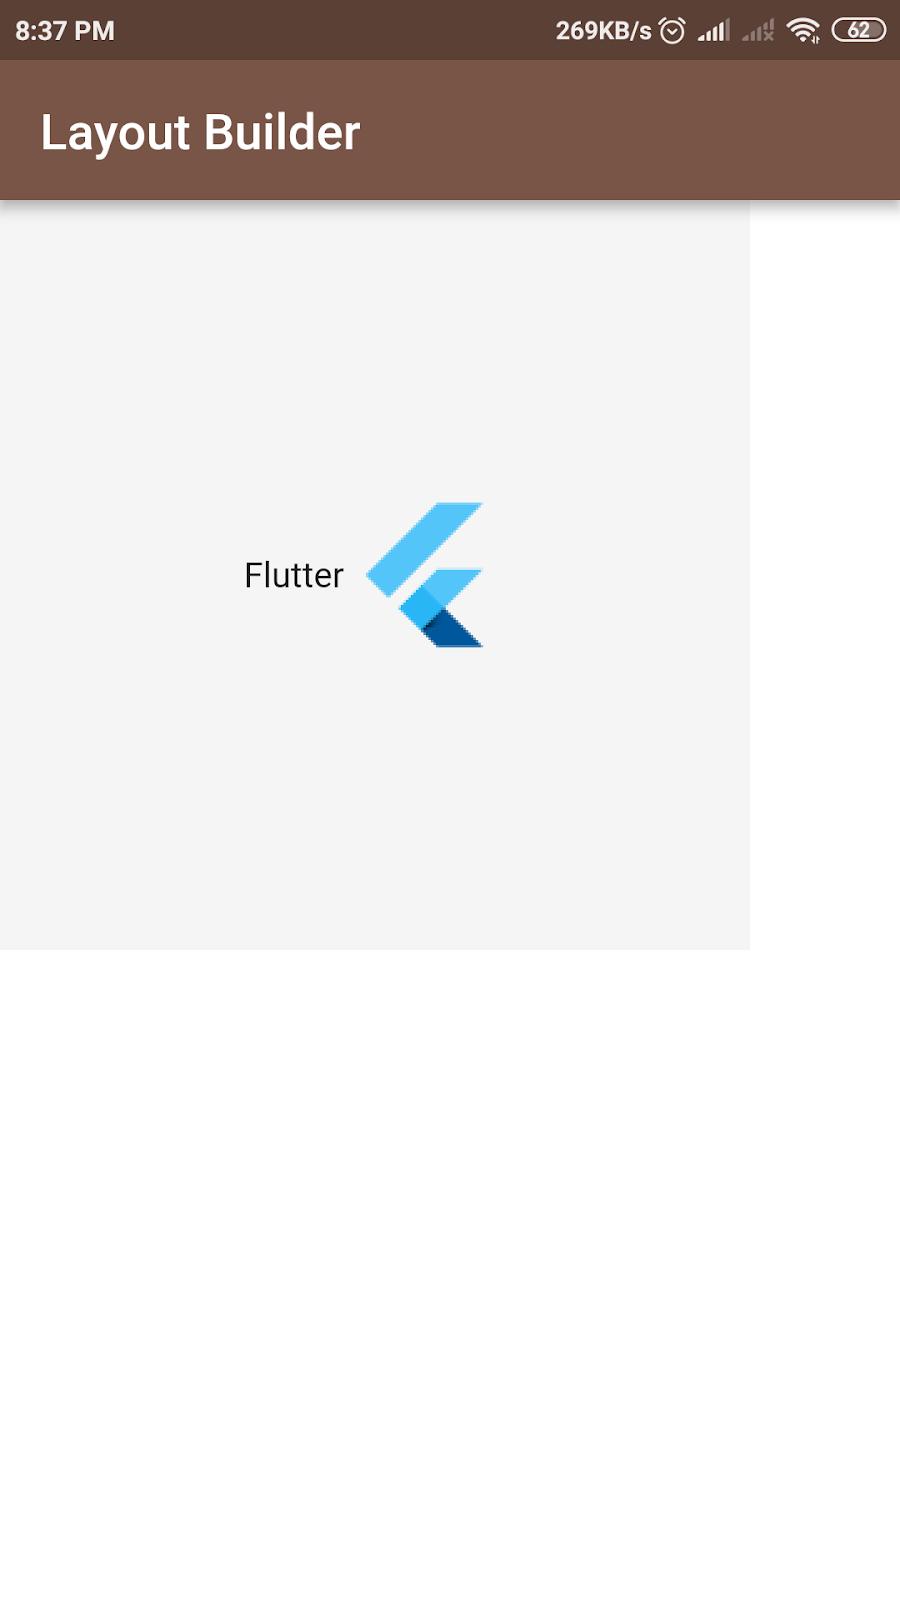 Flutter - LayoutBuilder, create responsive design